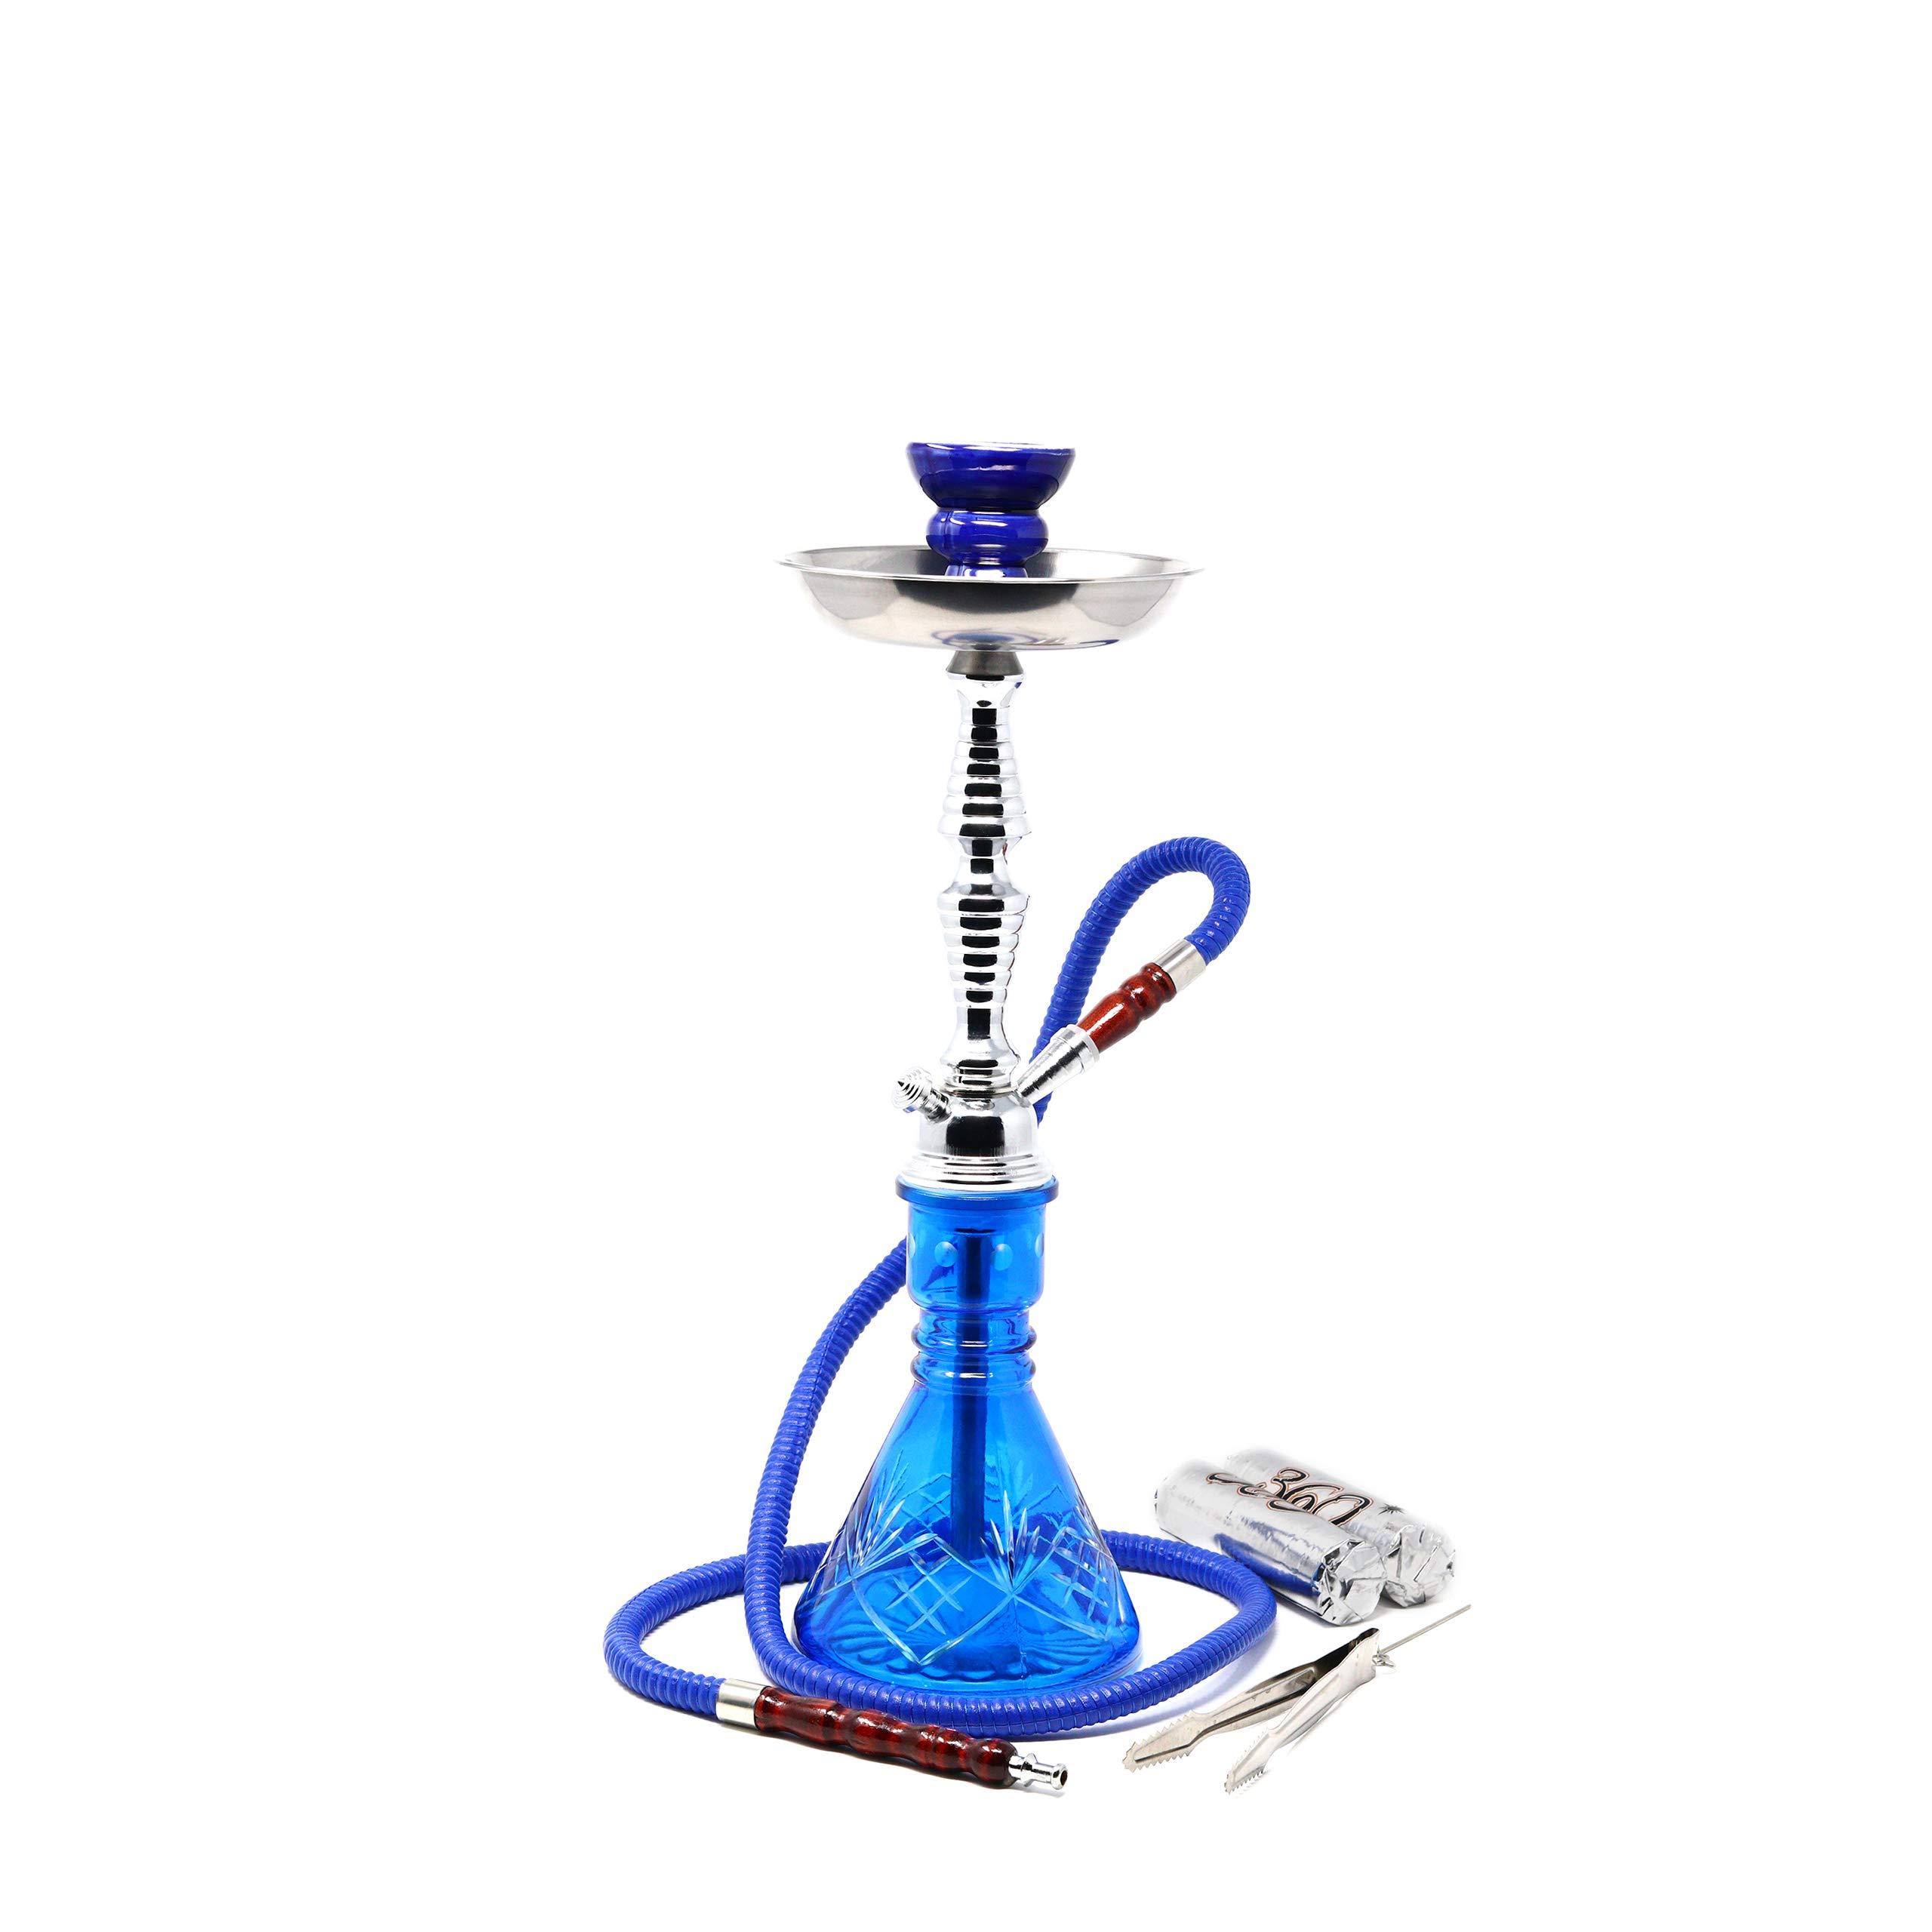 19 Inches Deezer Complete Hookah Set, Modern 1 Hose Hookah Kit with Hookah Accessories and Premium Shisha Coals 20 Tablets Blue Hookah Kit